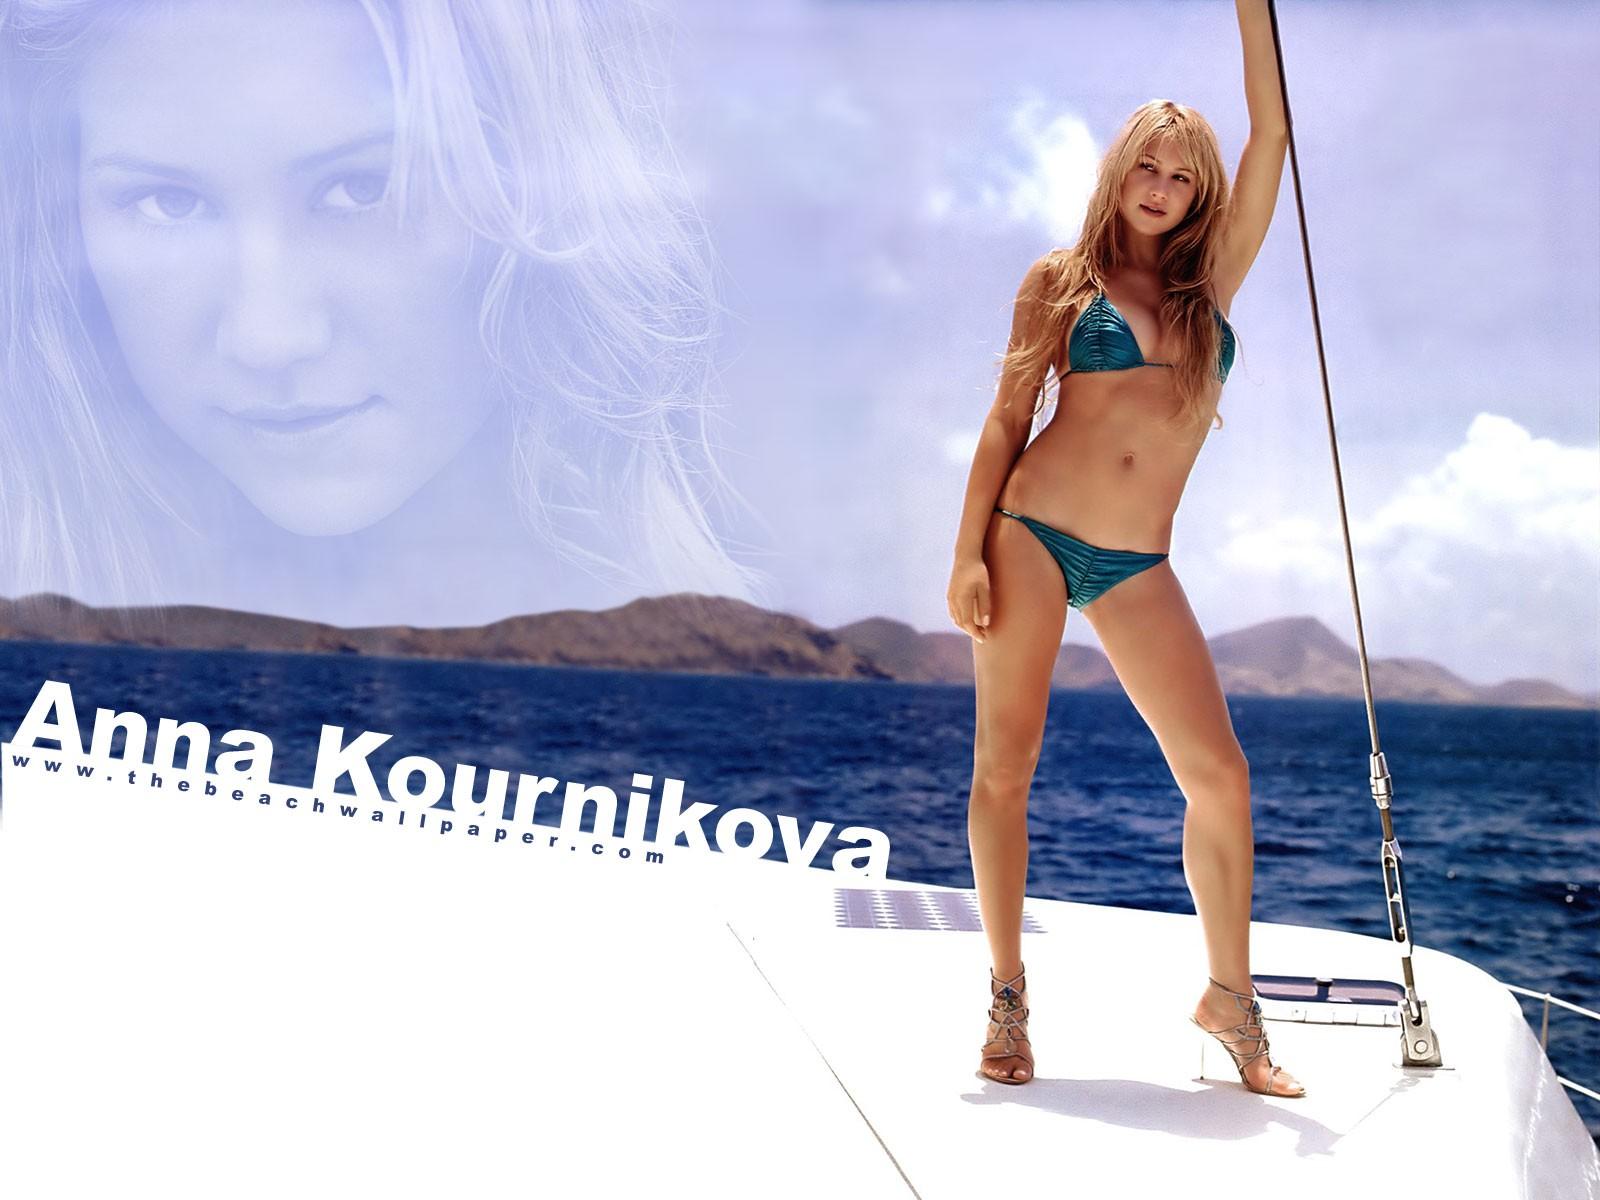 http://3.bp.blogspot.com/_yNFpw120XLc/THg_QWCPdcI/AAAAAAAAQoU/vTsdiE7Y6Kc/s1600/Anna_Kournikova_11056-729099.jpg